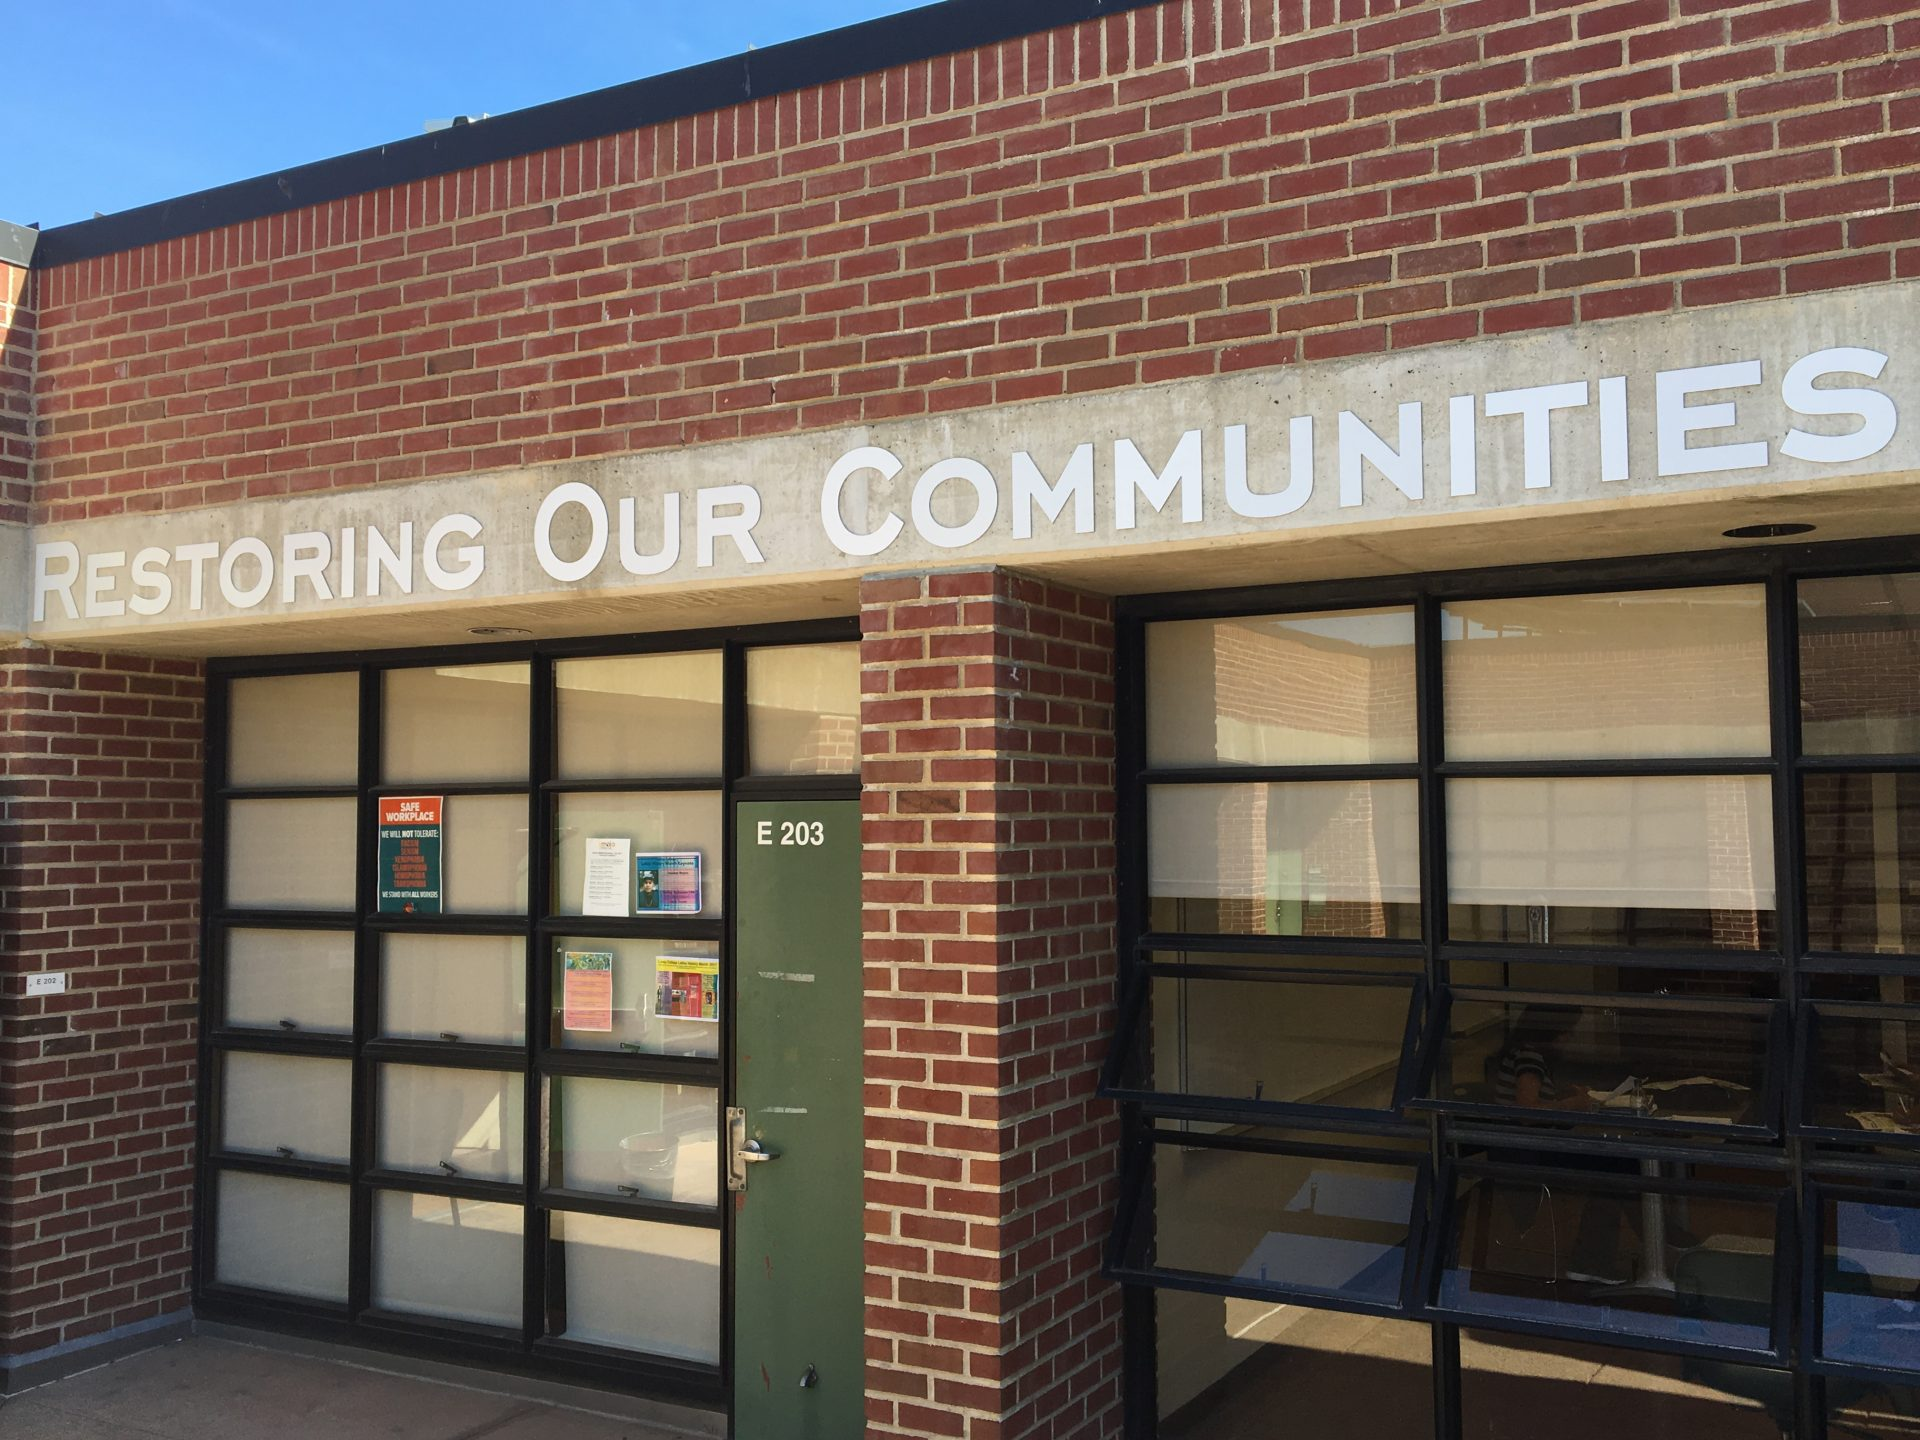 Restoring Our Communities (ROC) Office